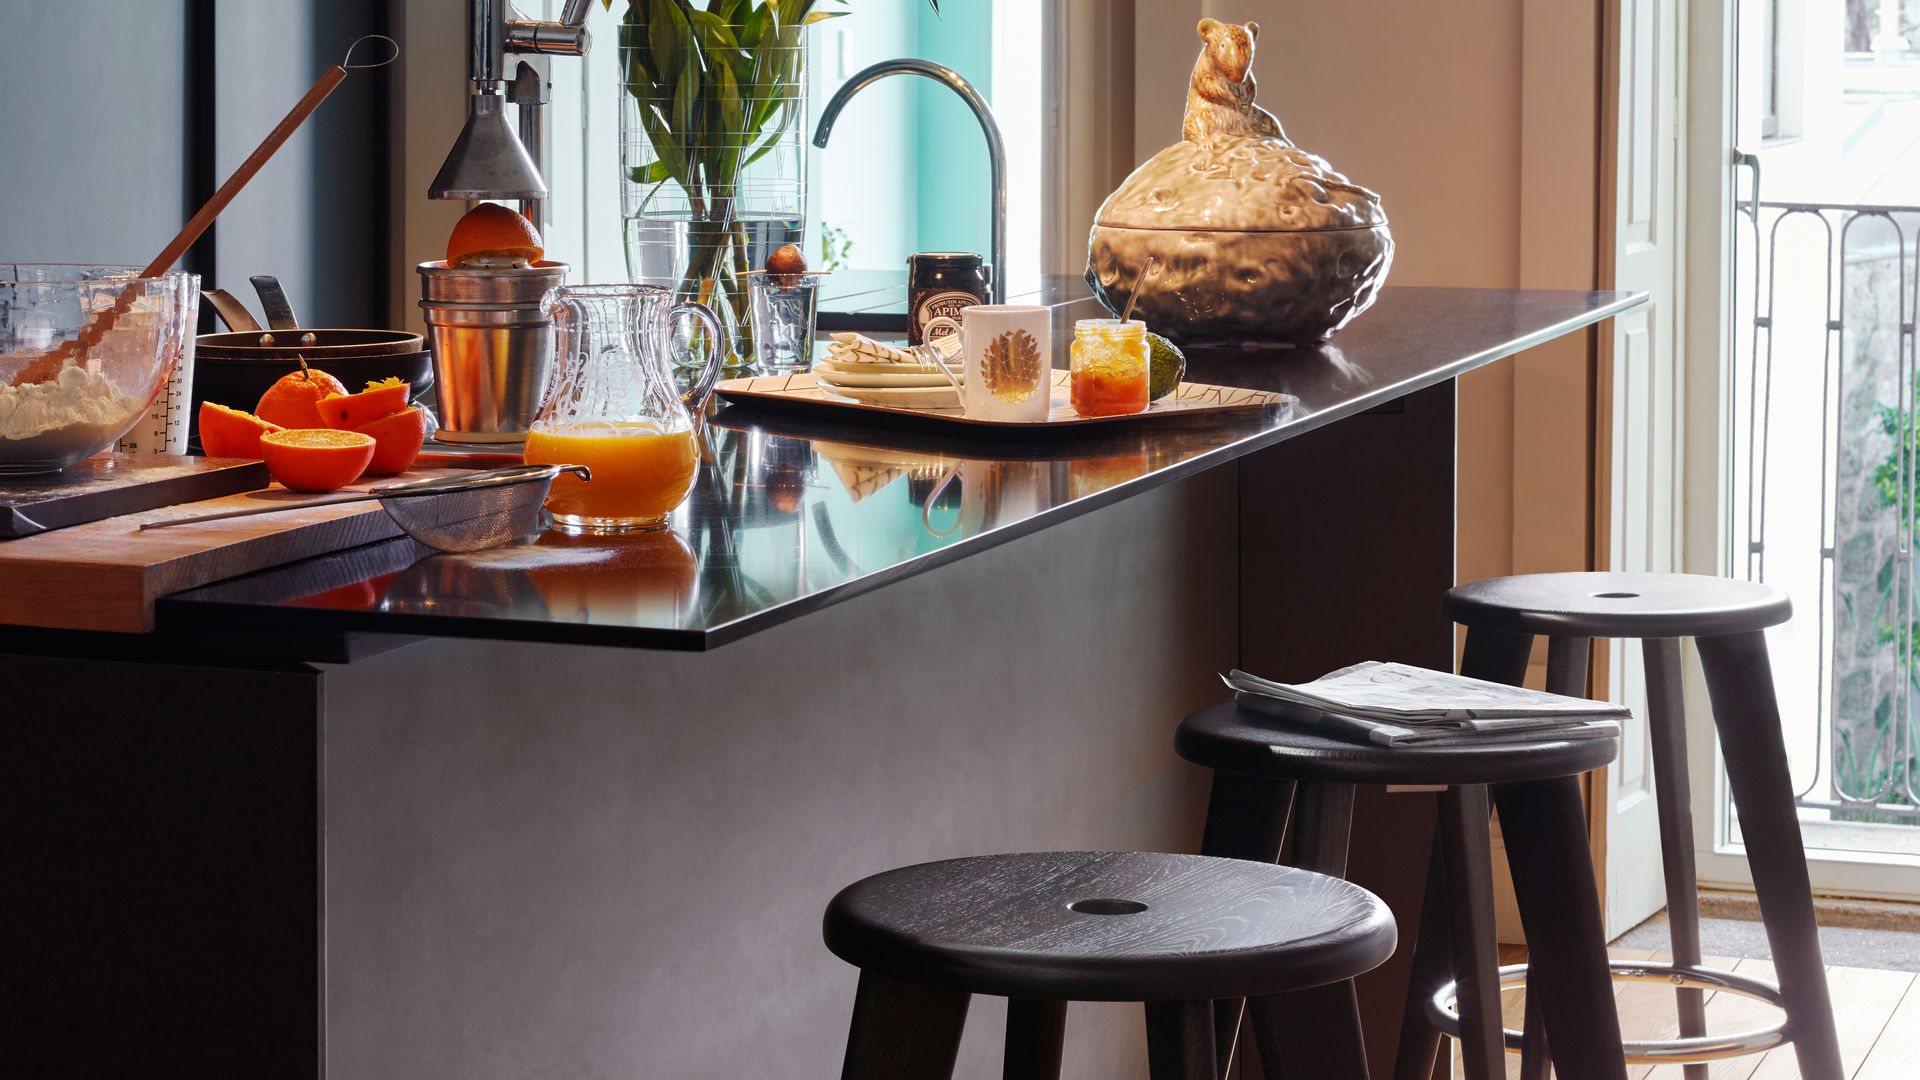 Tabouret Haut-Classic Trays-Coffee Mug_web_inspiration